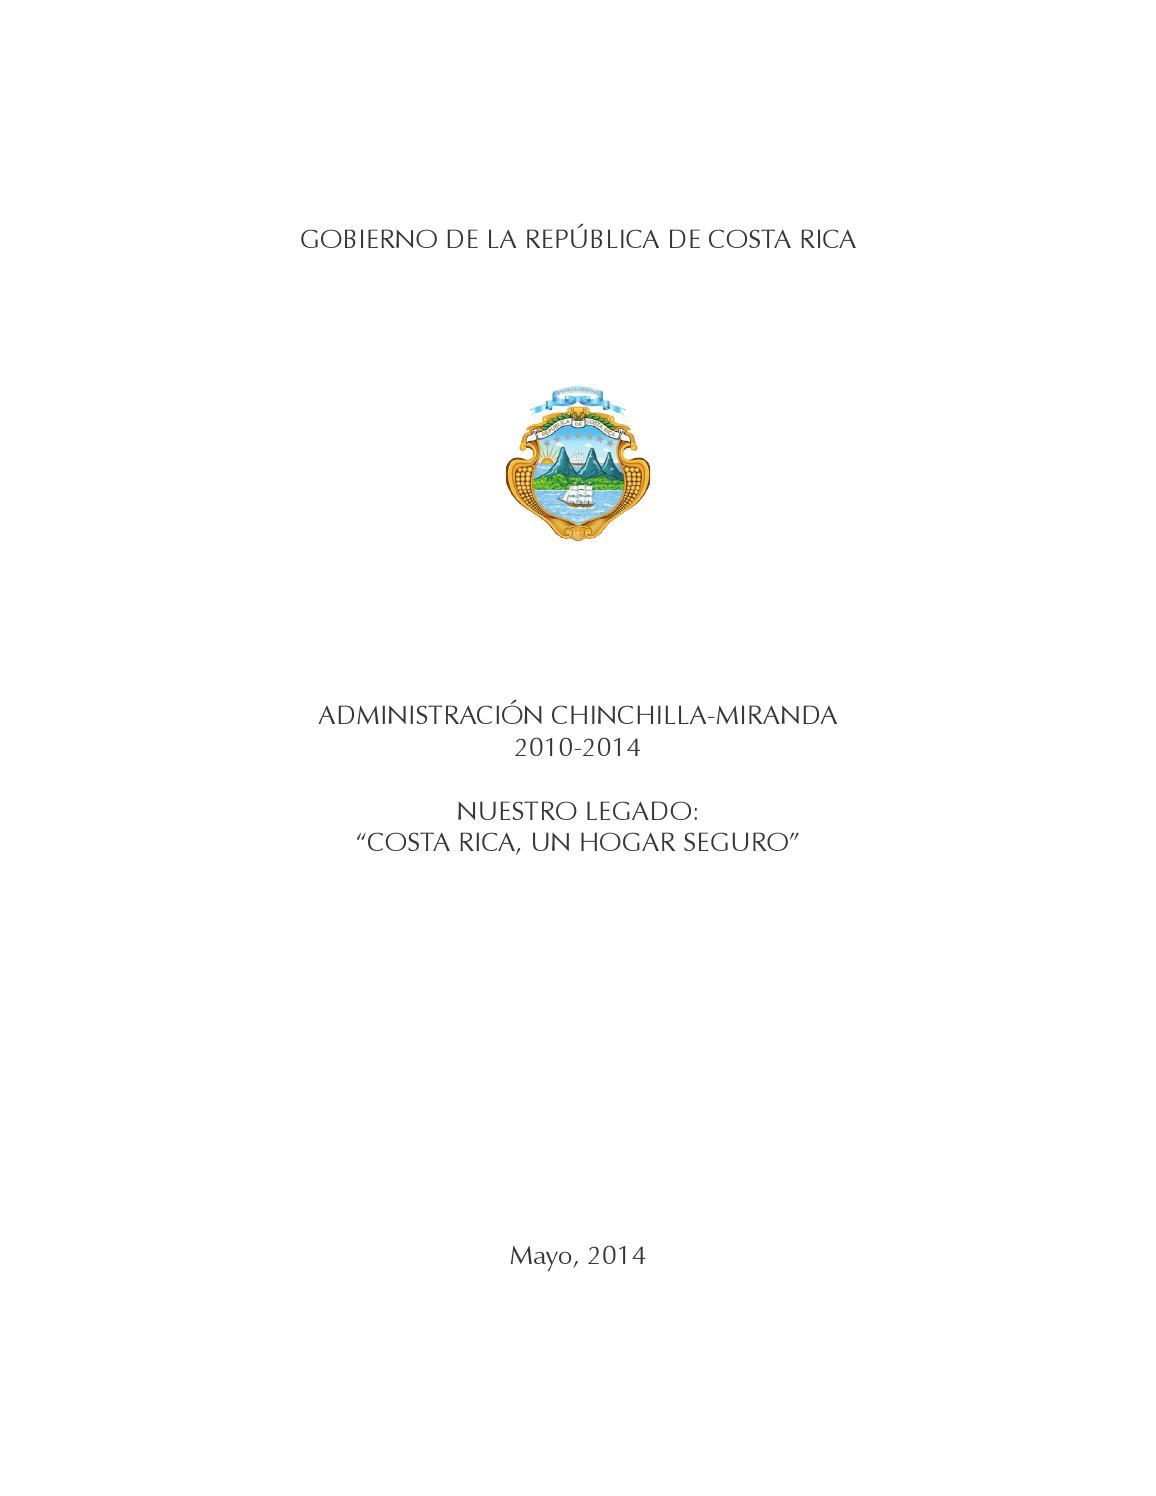 Memoria Administración Chinchilla 2010 - 2014 by PresidenciaCR - issuu